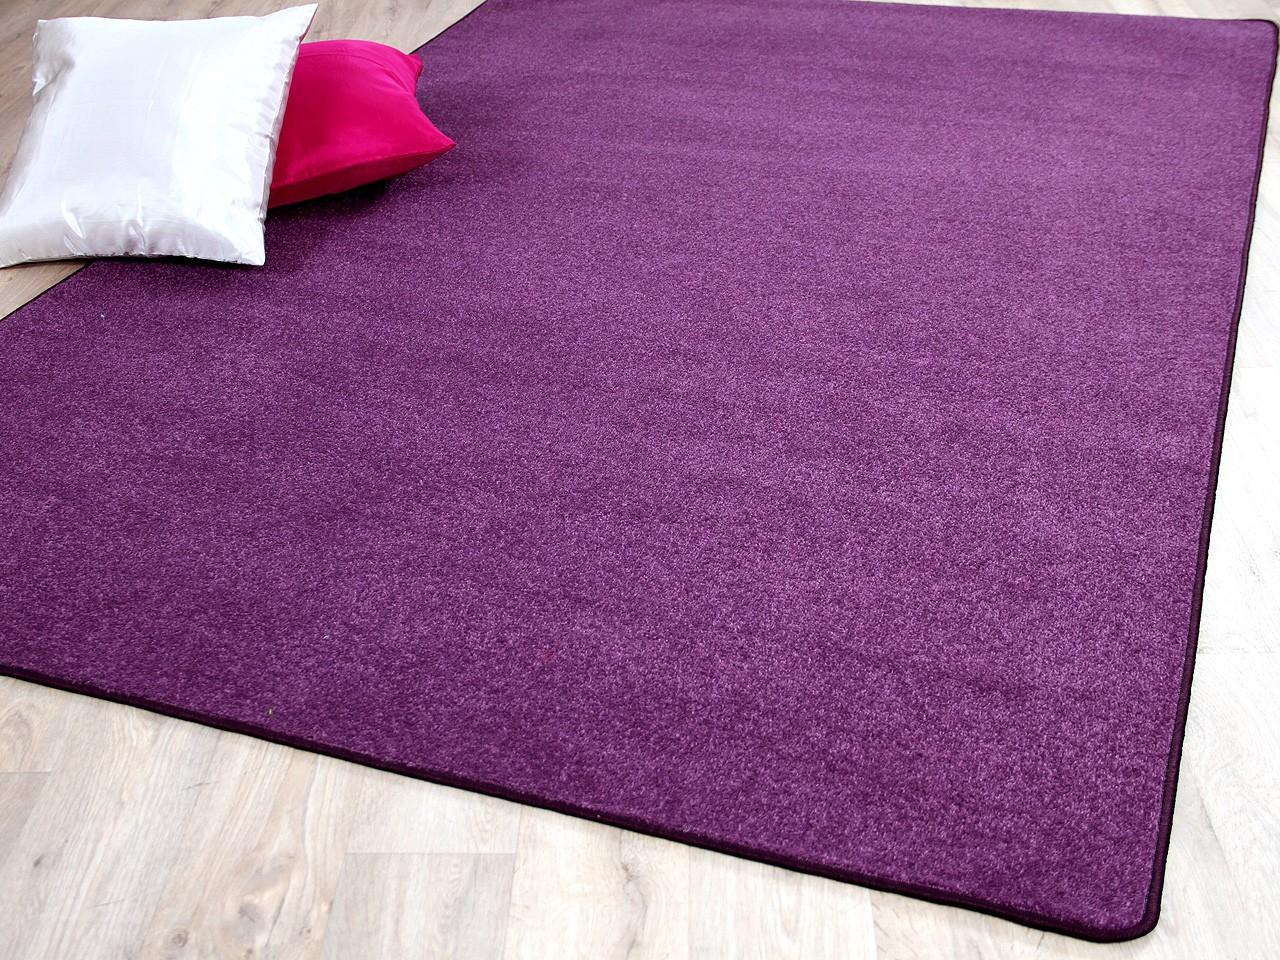 trend velours teppich joy lila sonderaktion teppiche veloursteppiche trend velours joy. Black Bedroom Furniture Sets. Home Design Ideas